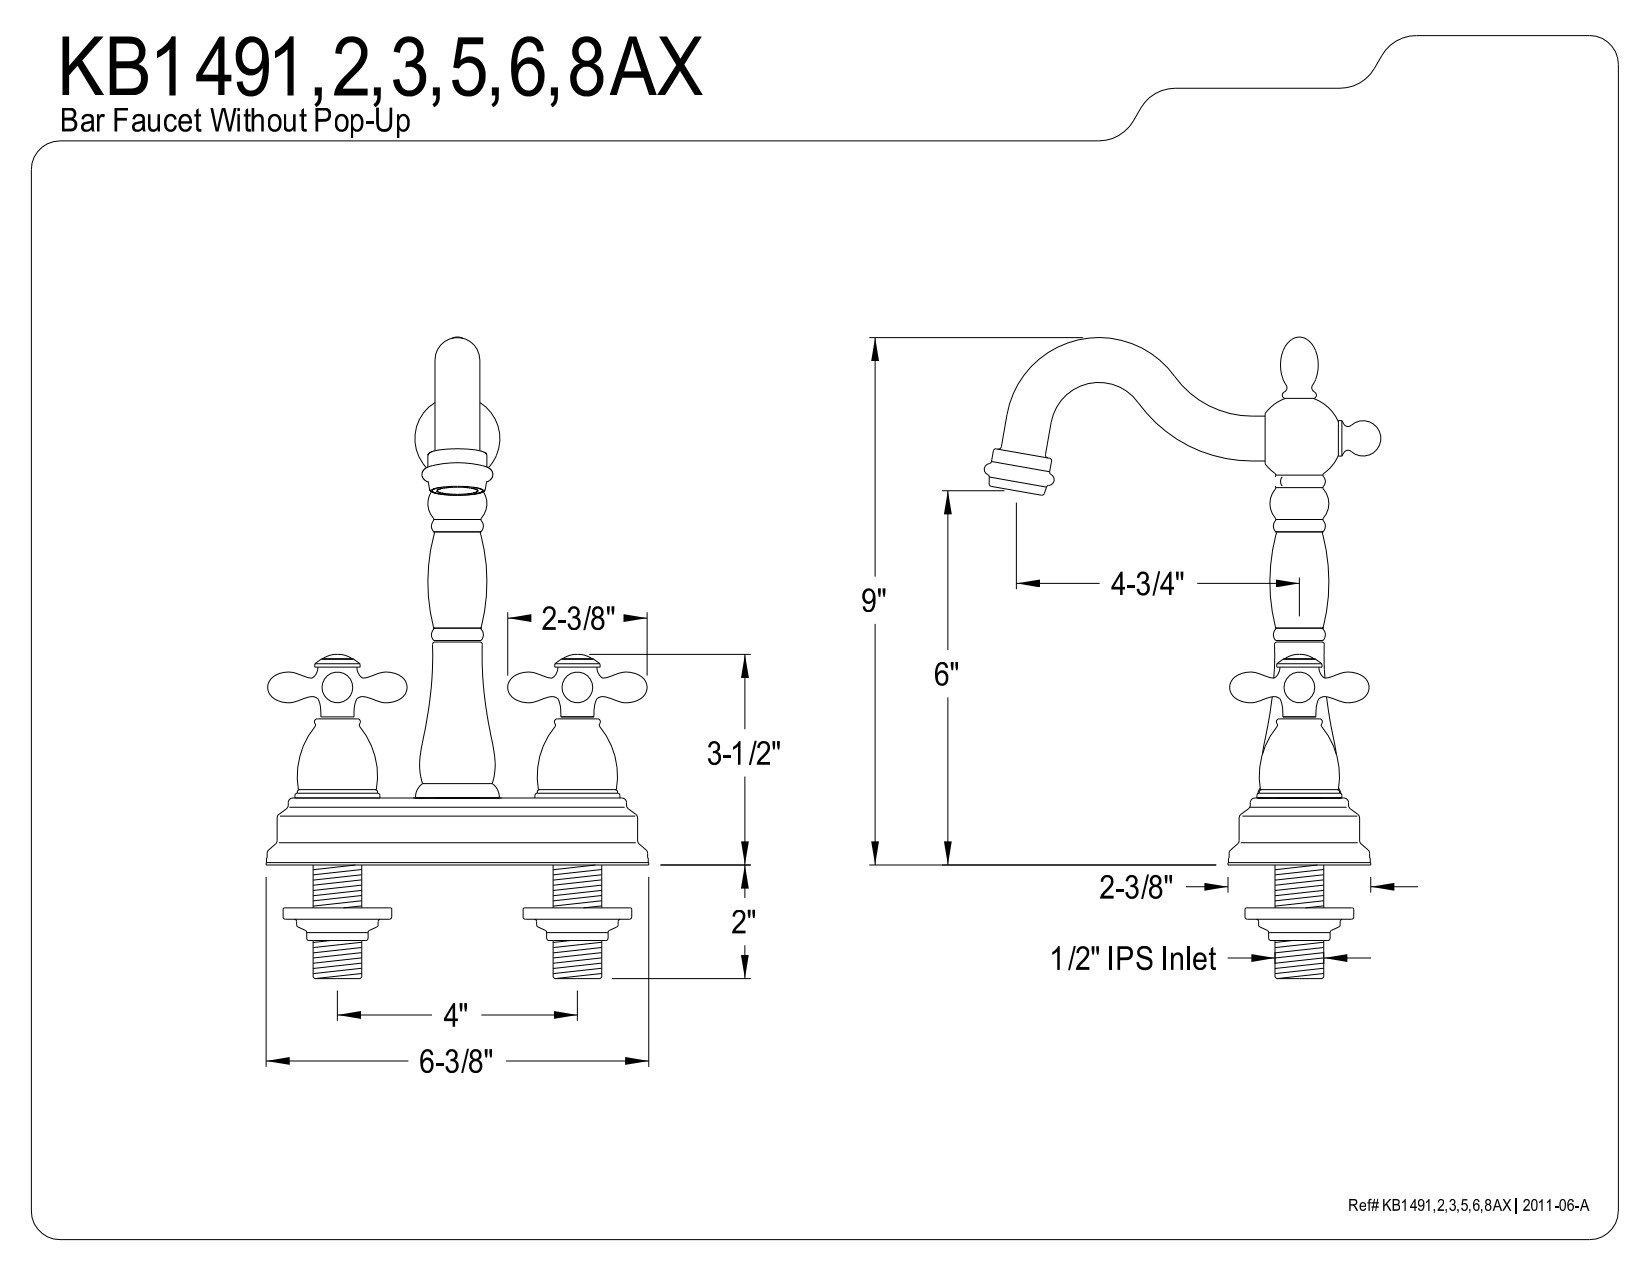 Kingston Brass KB1492AX 4'' bar Faucet Without Pop-Up Rod, Polished Brass by Kingston Brass